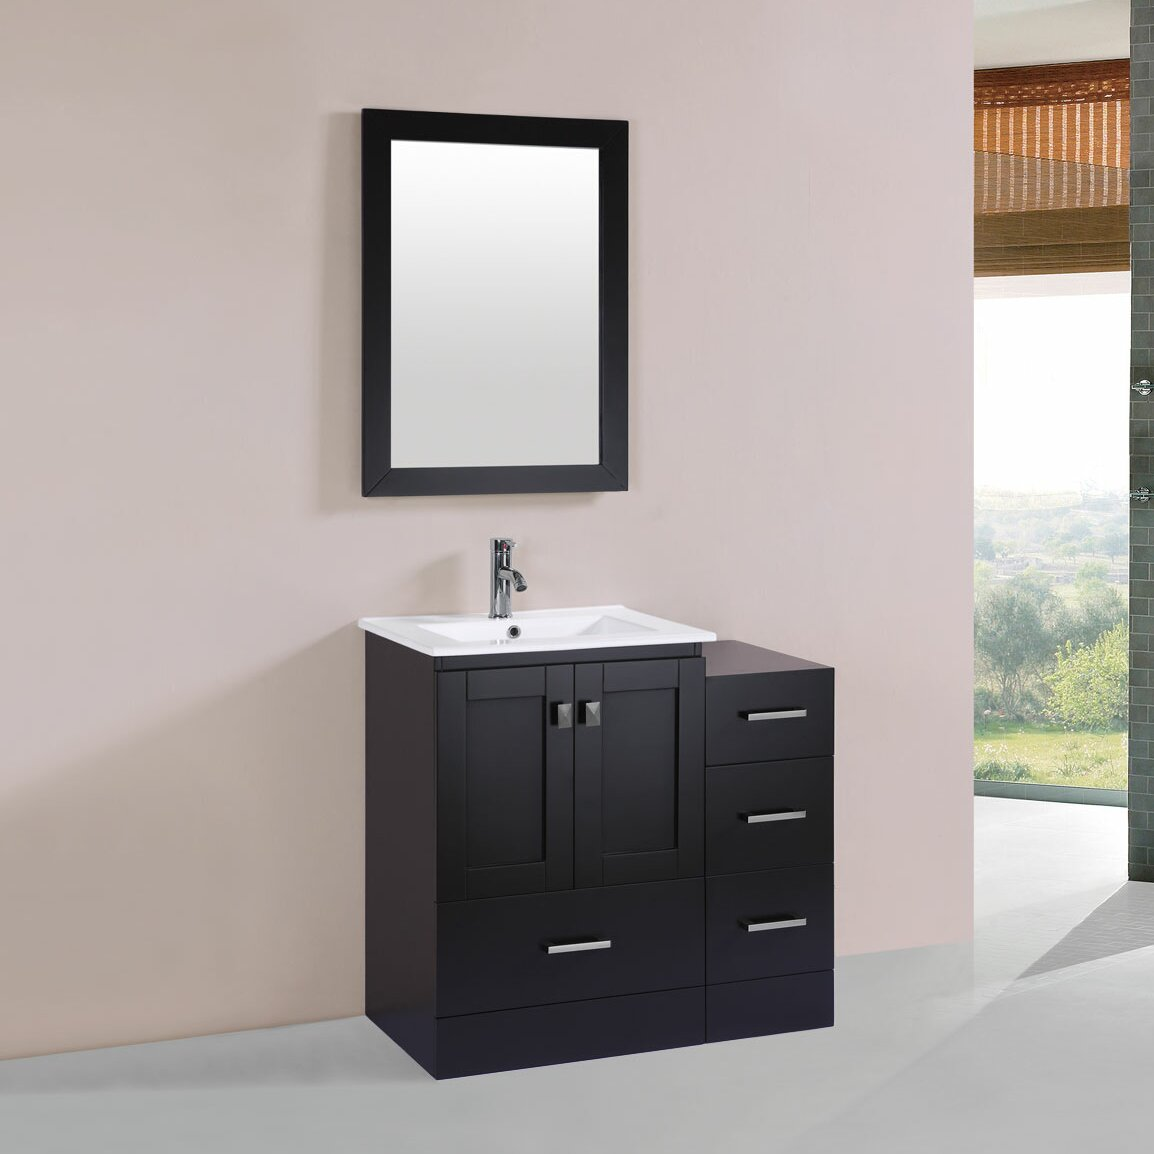 Pacificcollection Redondo 36 Single Modern Bathroom Side Cabinet Vanity Set Reviews